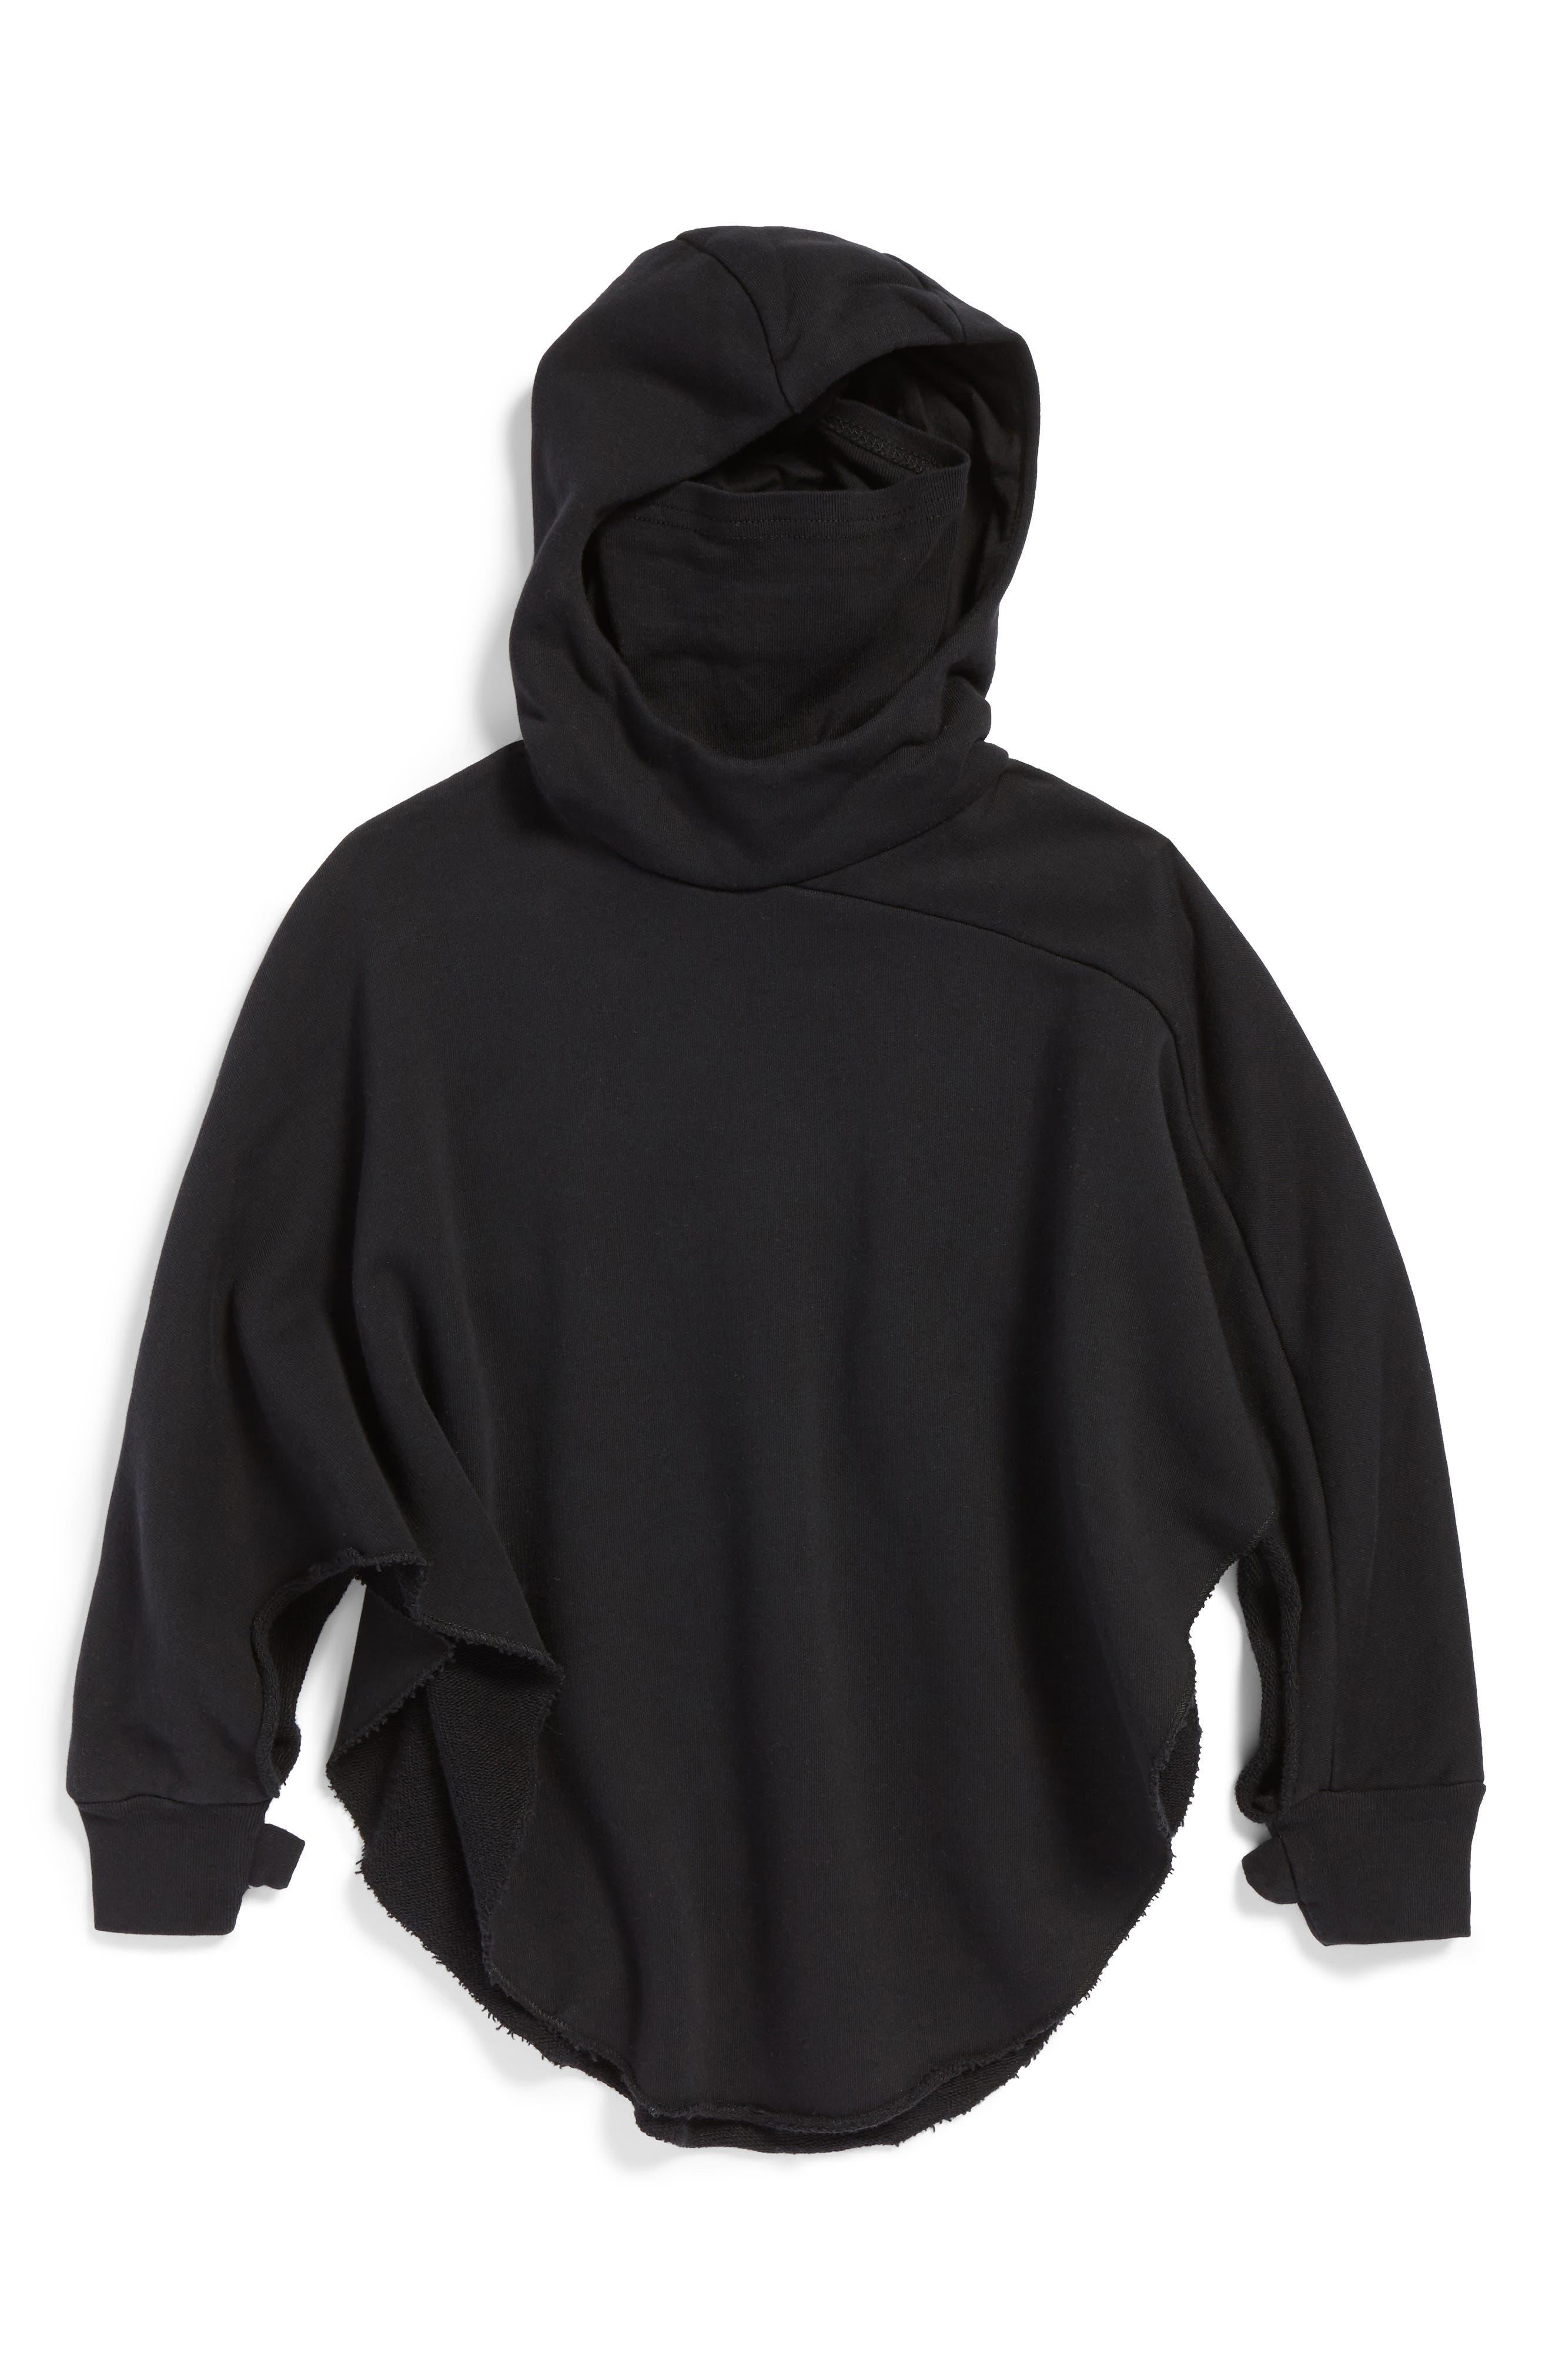 Ninja Hooded Poncho,                         Main,                         color, 001